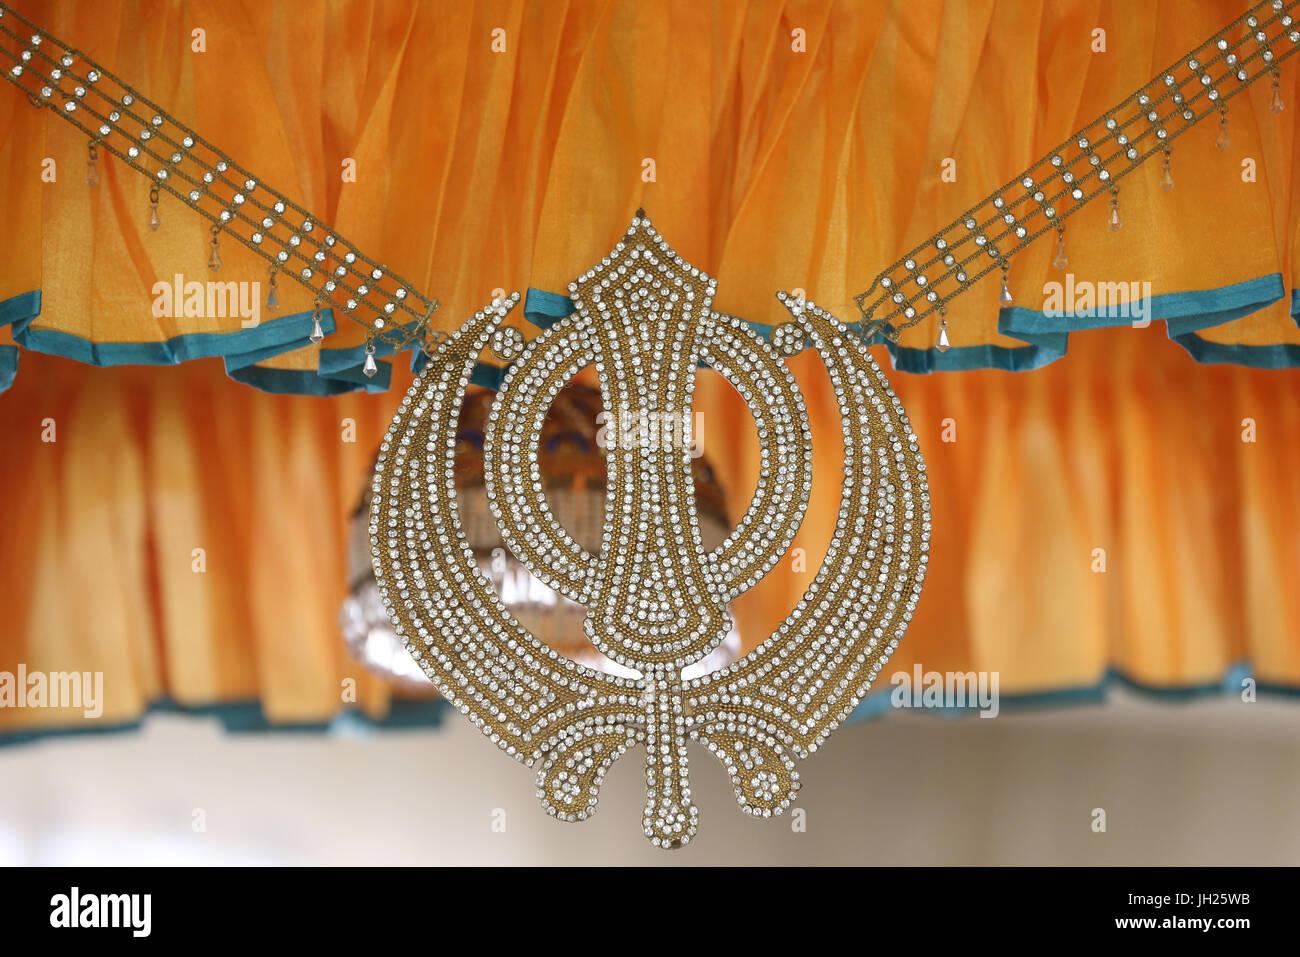 Gurdwara Sahib Silat Road ( Silat Road Sikh Temple ).  Khanda (Sikh symbol).  Singapore. Stock Photo